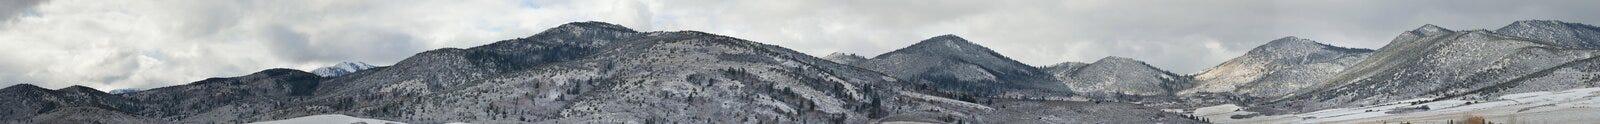 ammerbach德国获得草耶拿牧场地绵羊雪图林根州在谷walley冬天之下 库存照片